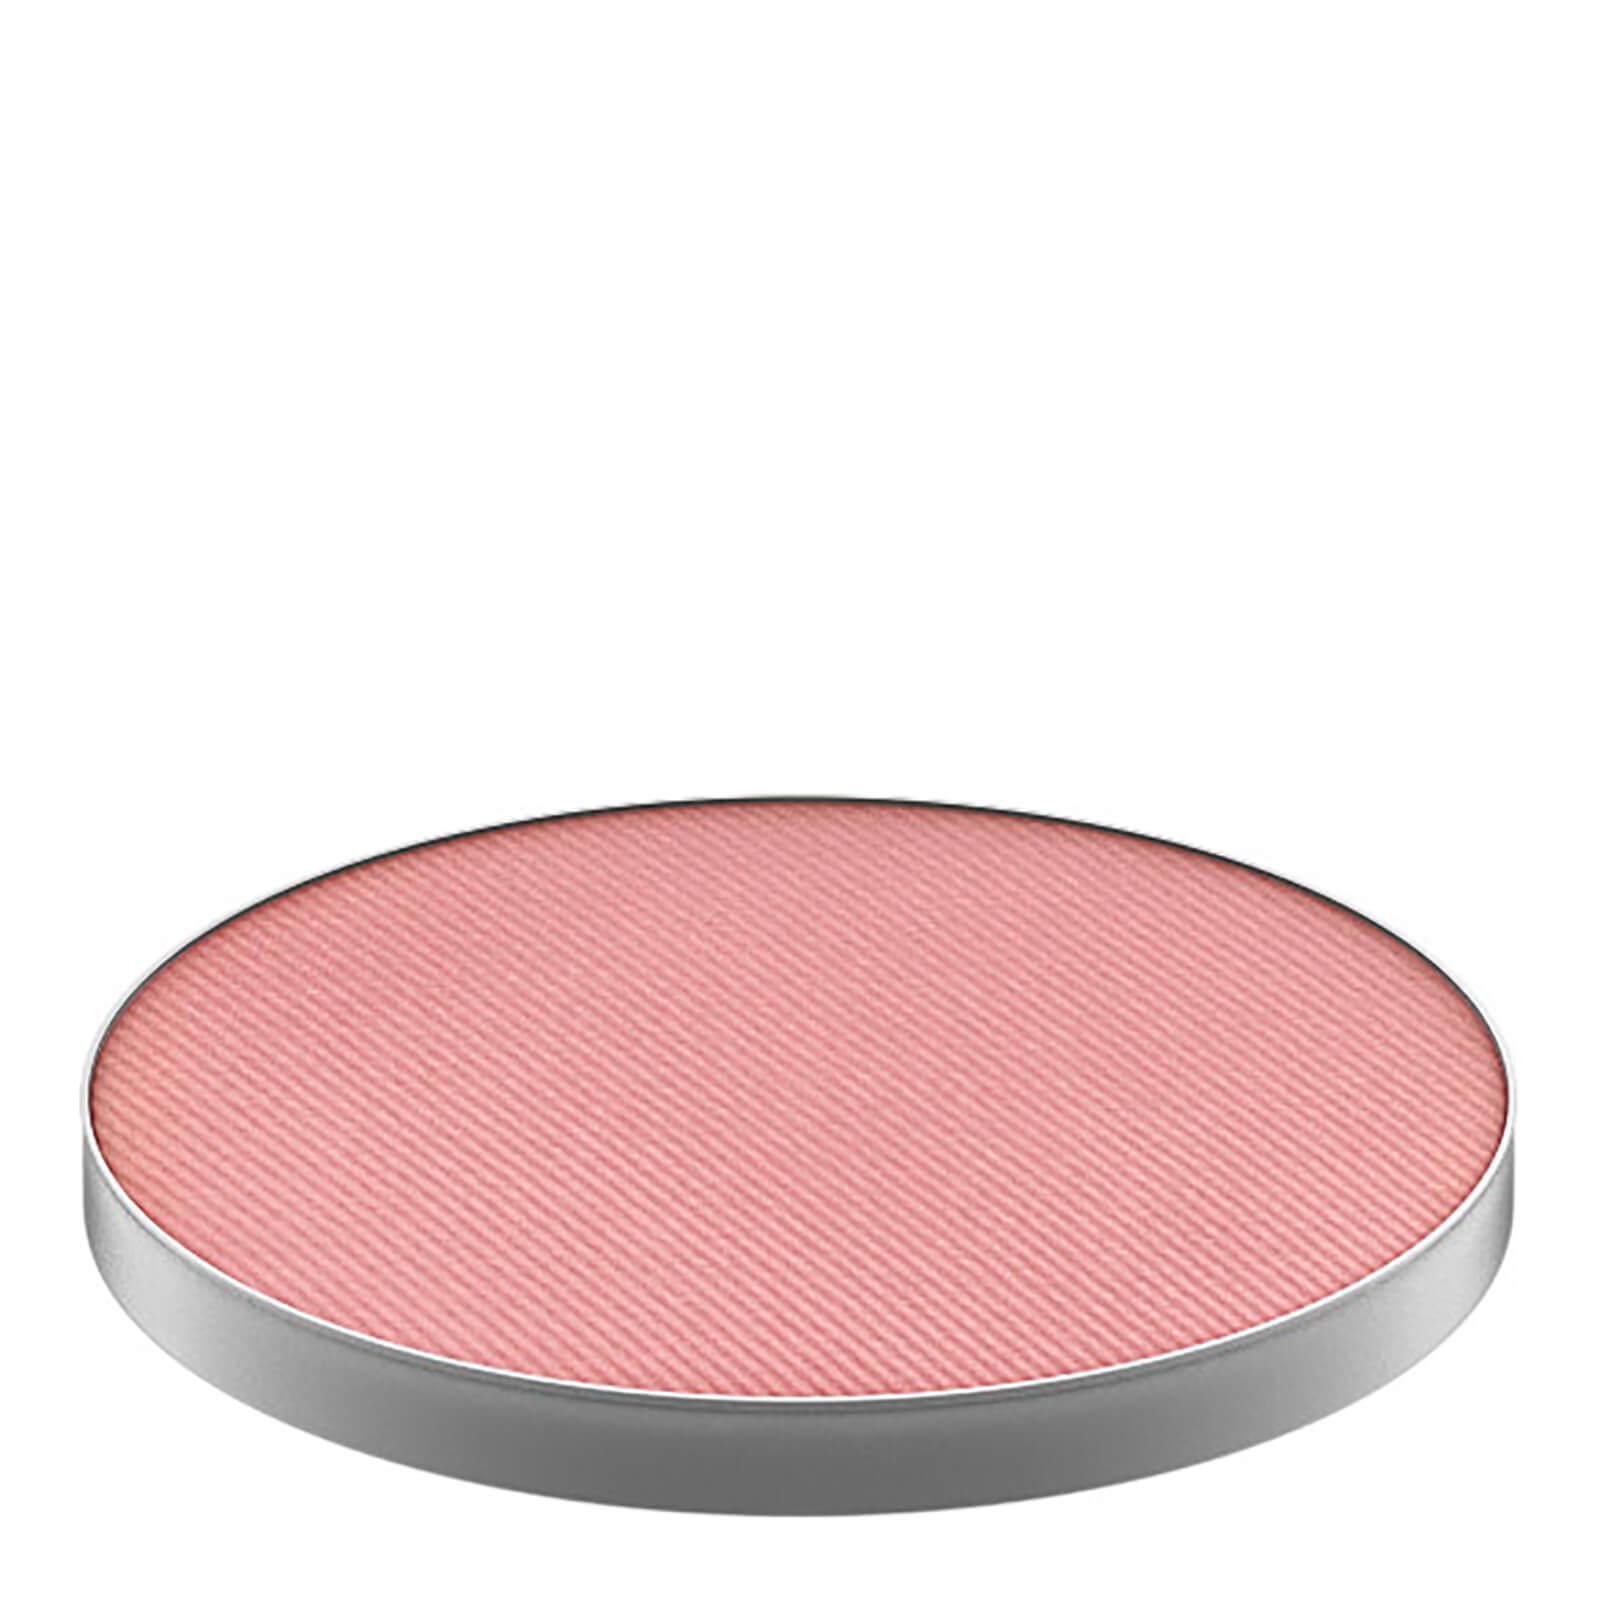 MAC Sheertone Blush Pro Palette Refill (Various Shades) - Blushbaby